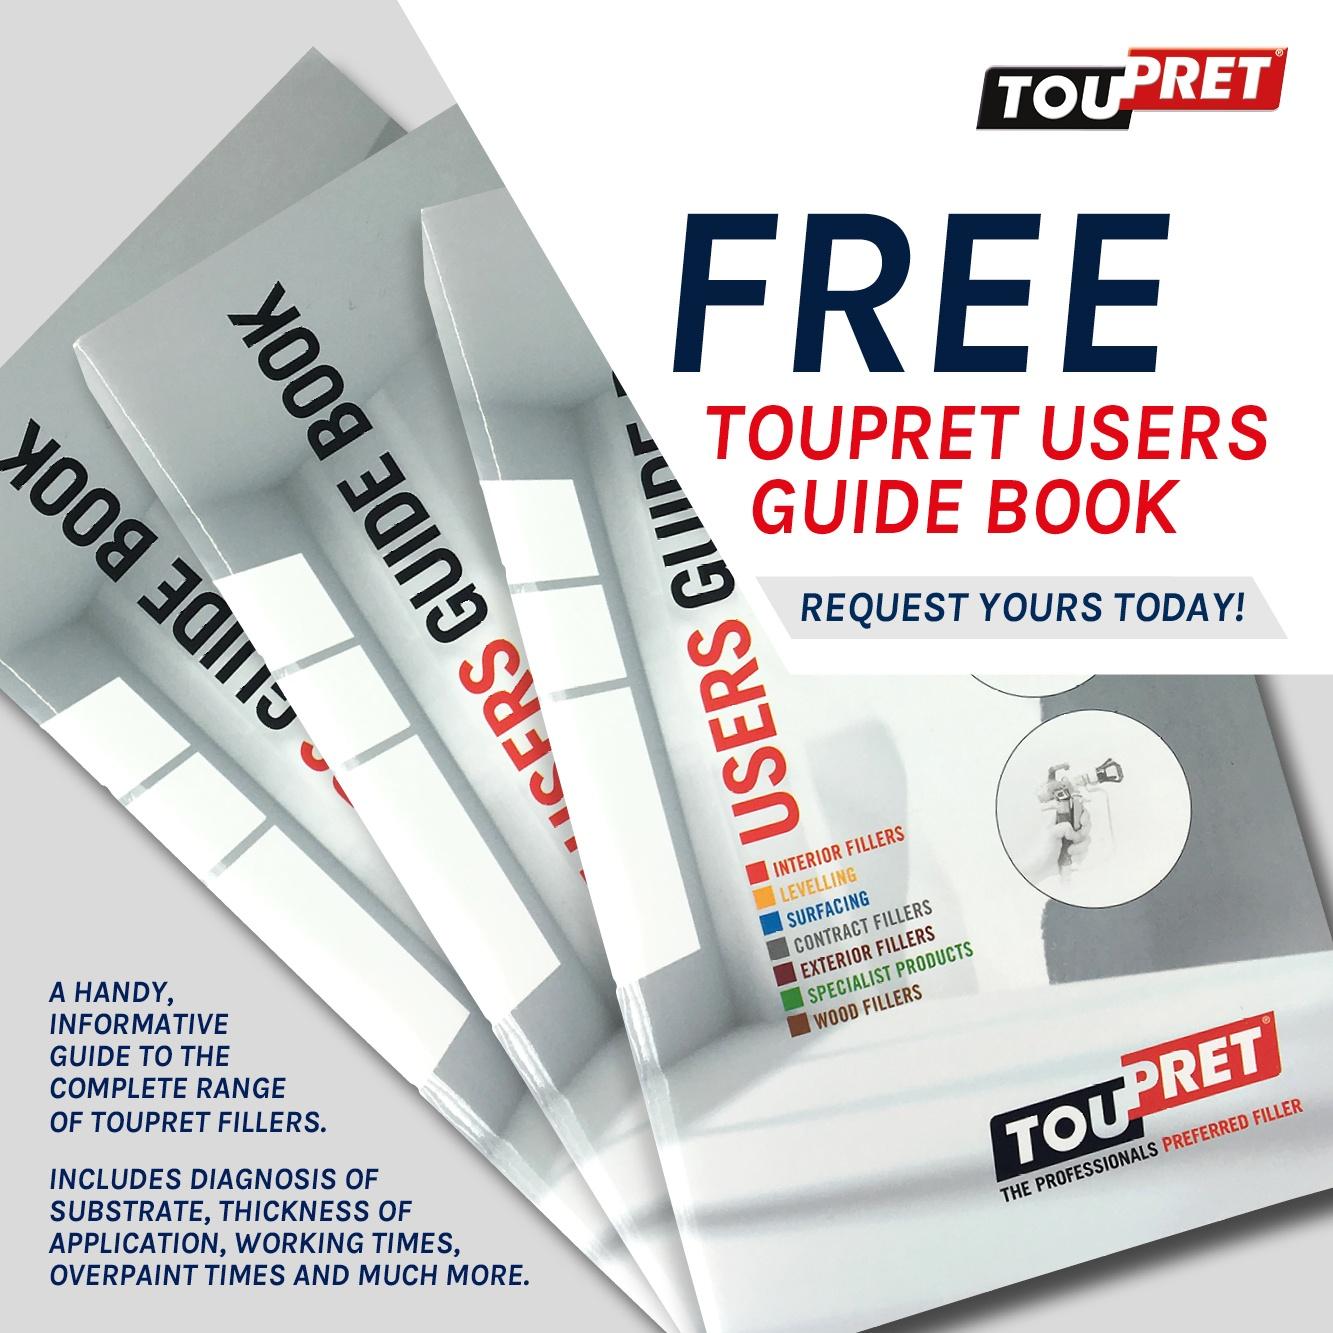 Toupret User Guide Landing Page 1000x1000 1017.jpg